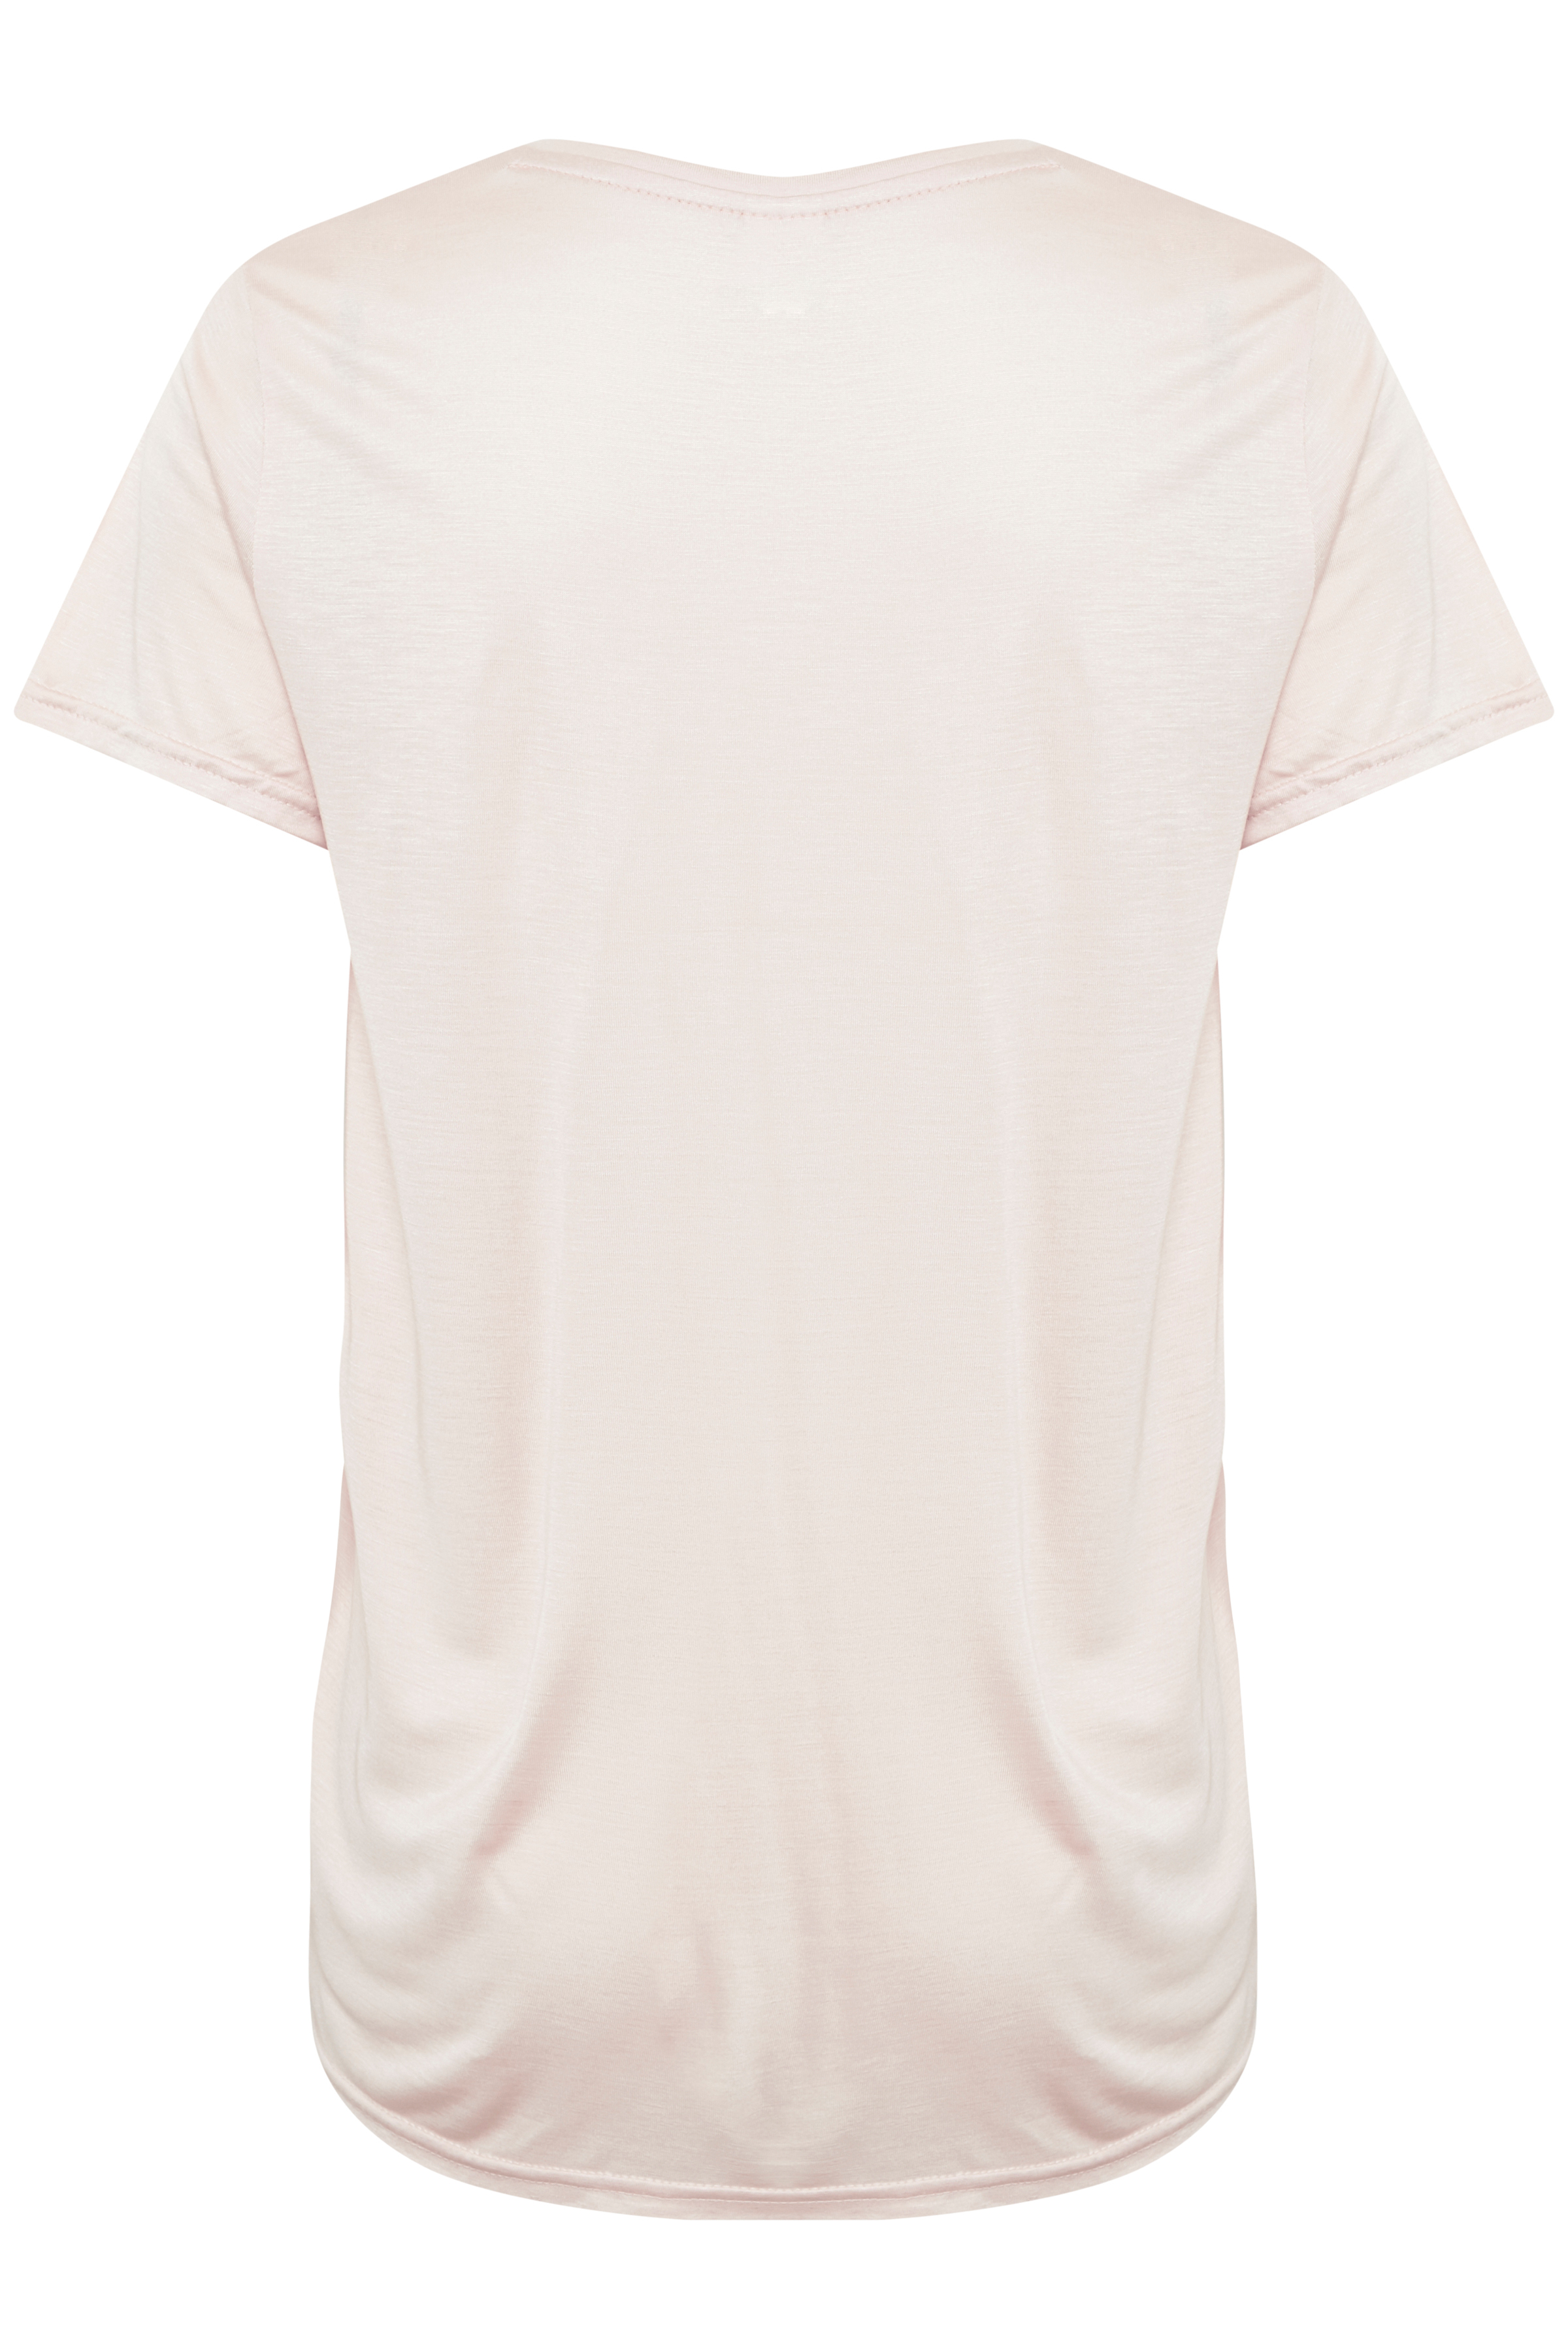 Hellrosa Kurzarm T-Shirt von Kaffe – Shoppen Sie Hellrosa Kurzarm T-Shirt ab Gr. XS-XXL hier